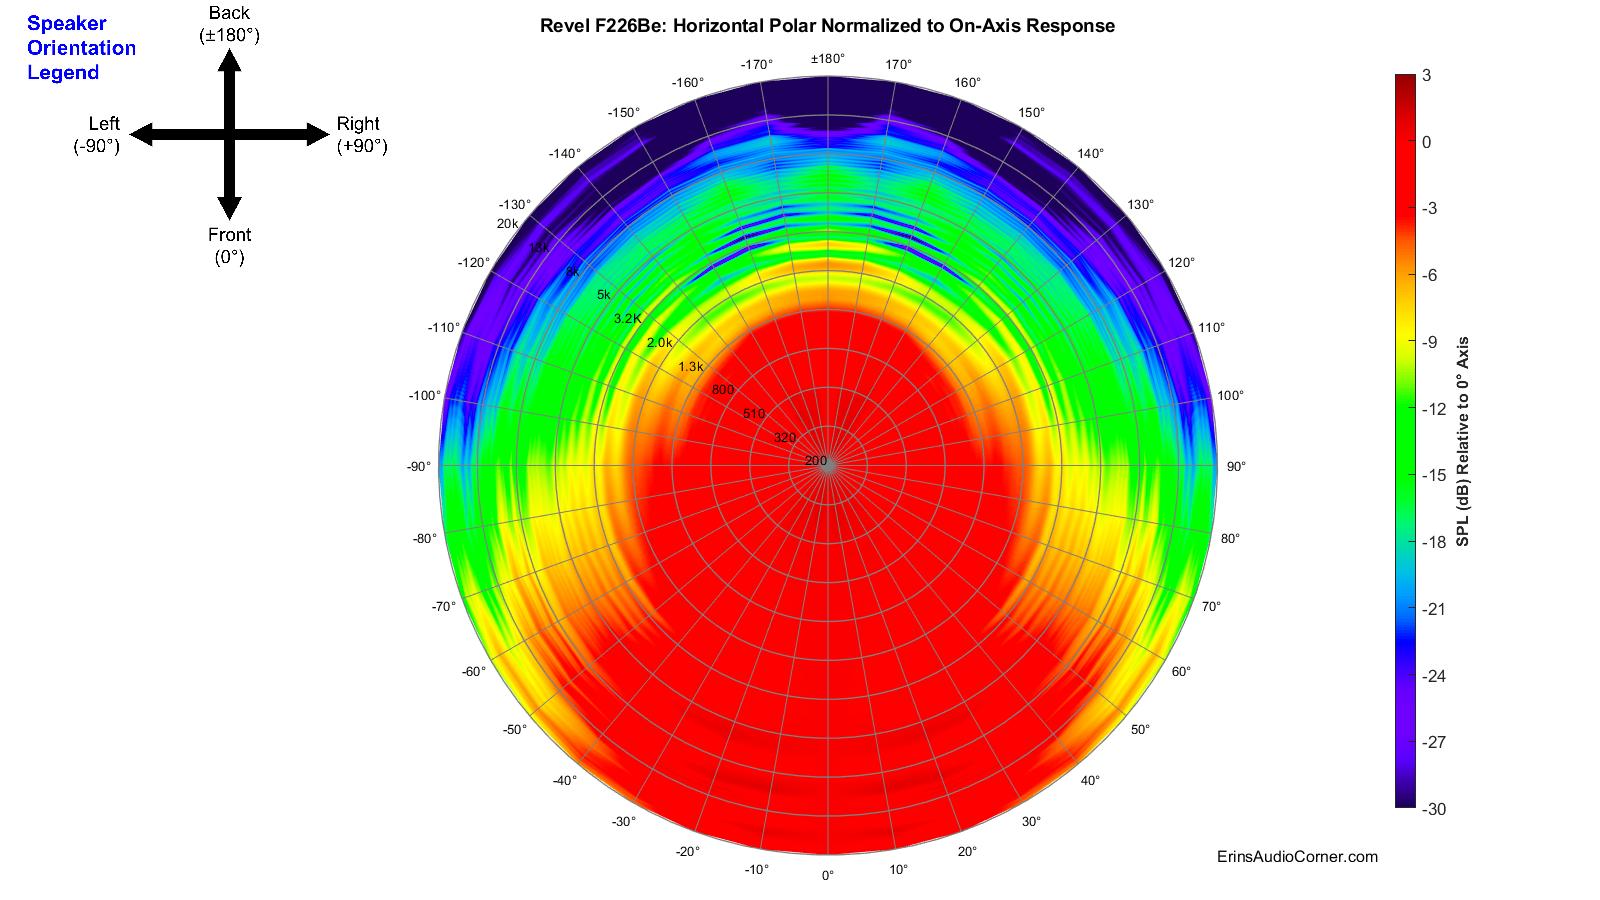 Revel%20F226Be_360_Horizontal_Polar_Normalized.png